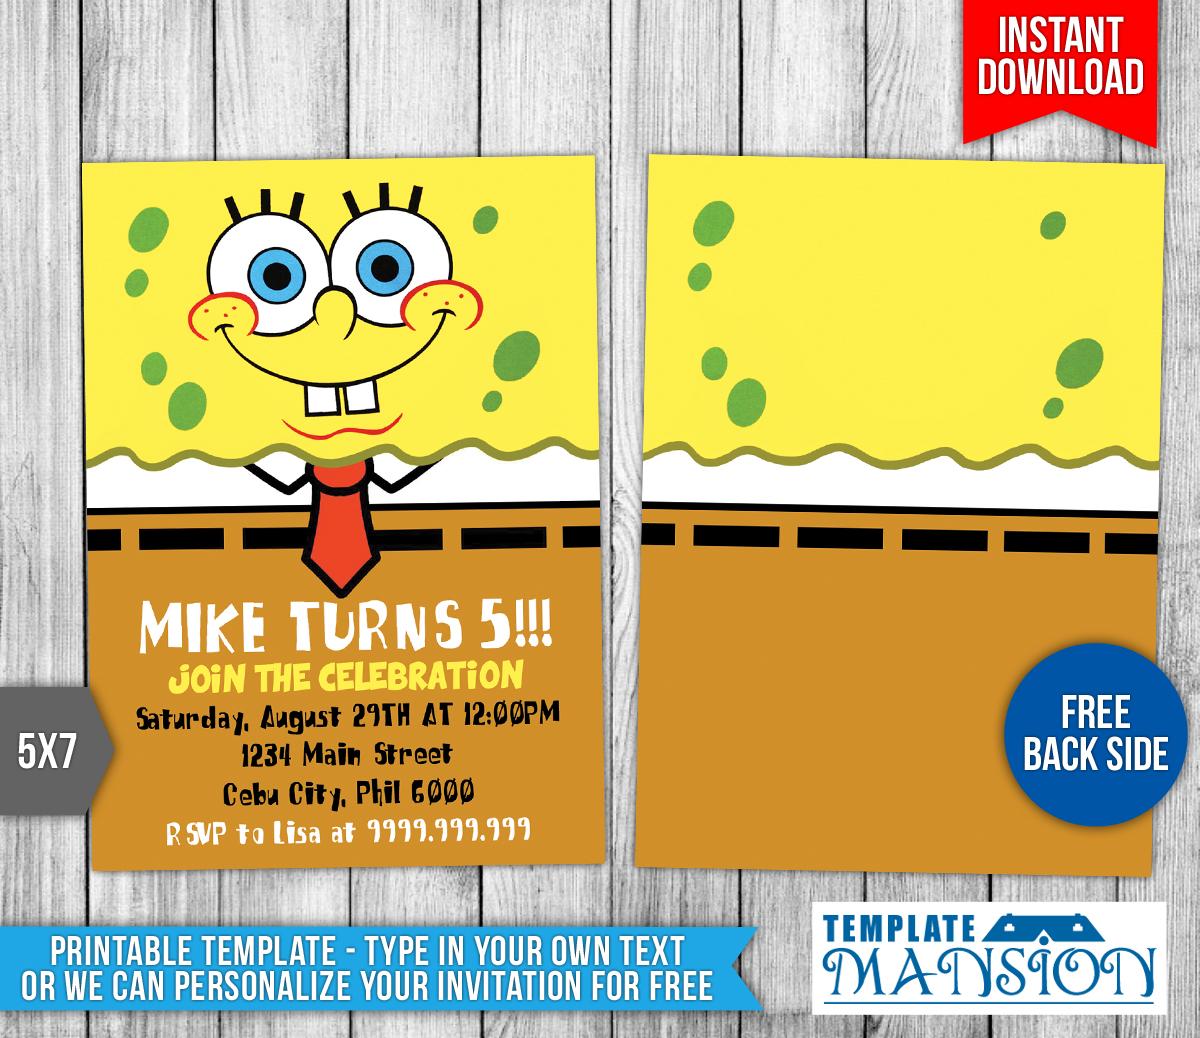 Spongebob Templates Free Spongebob Squarepants